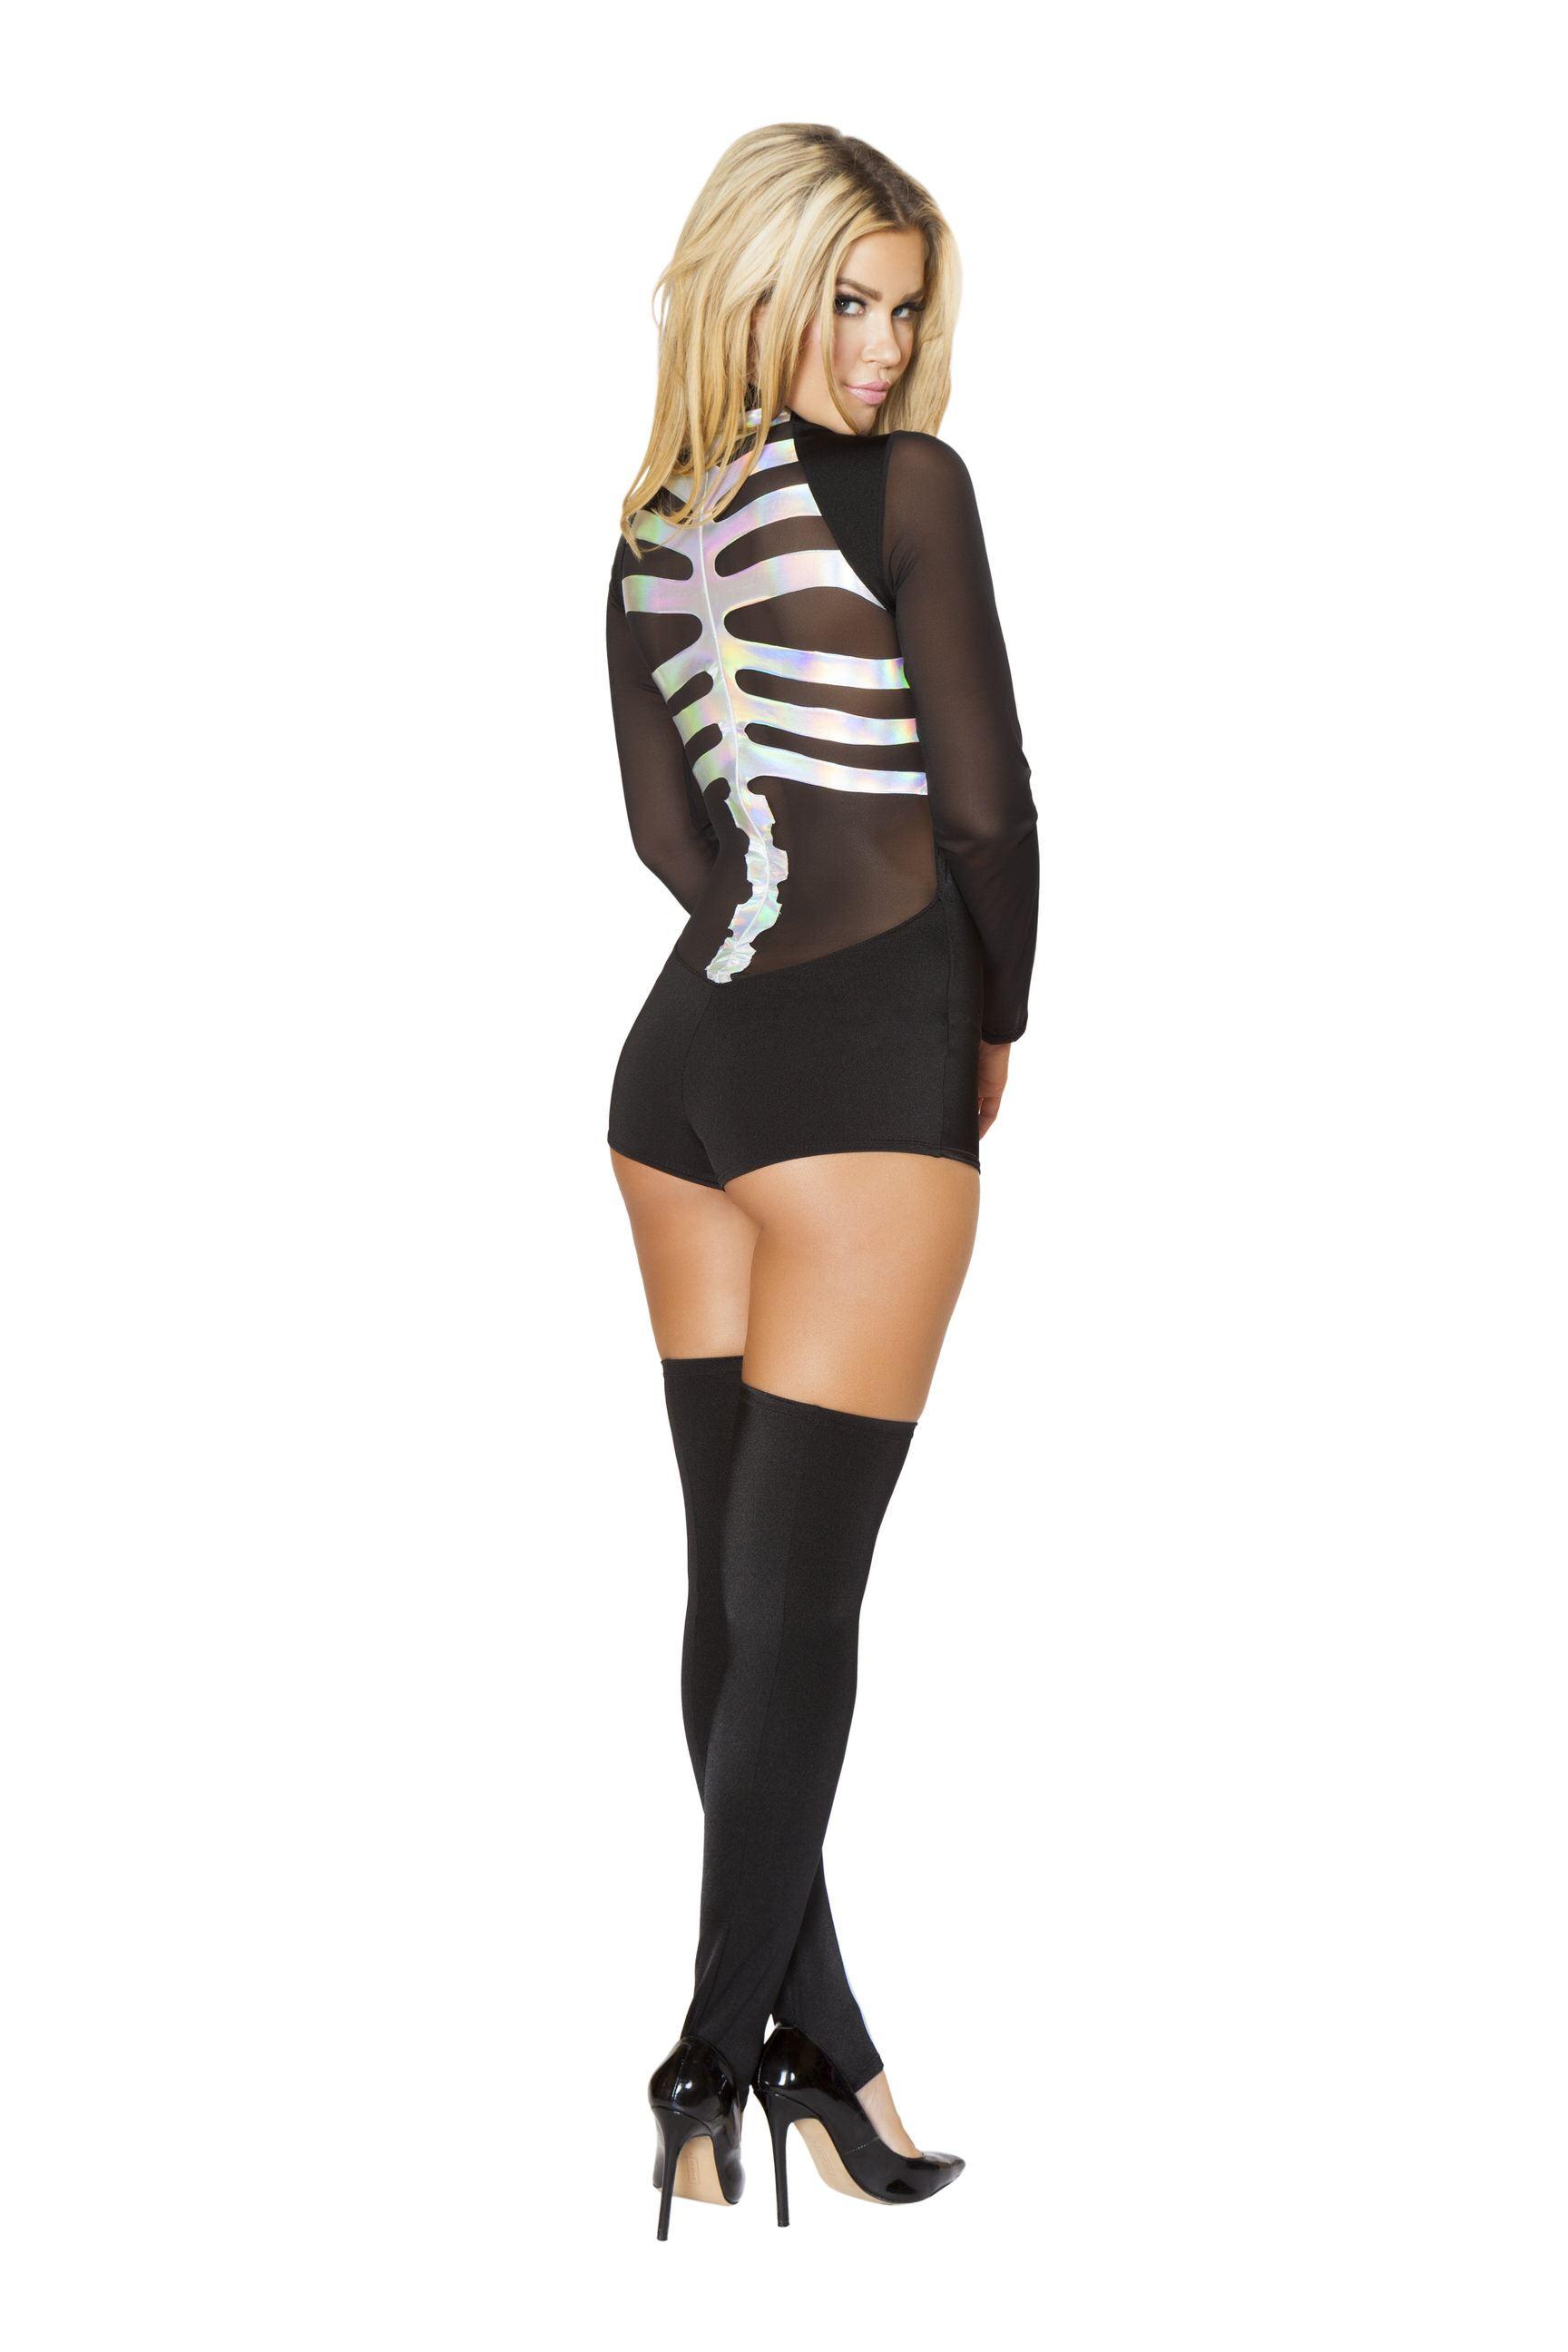 Halloween Costumes Zombie Woman